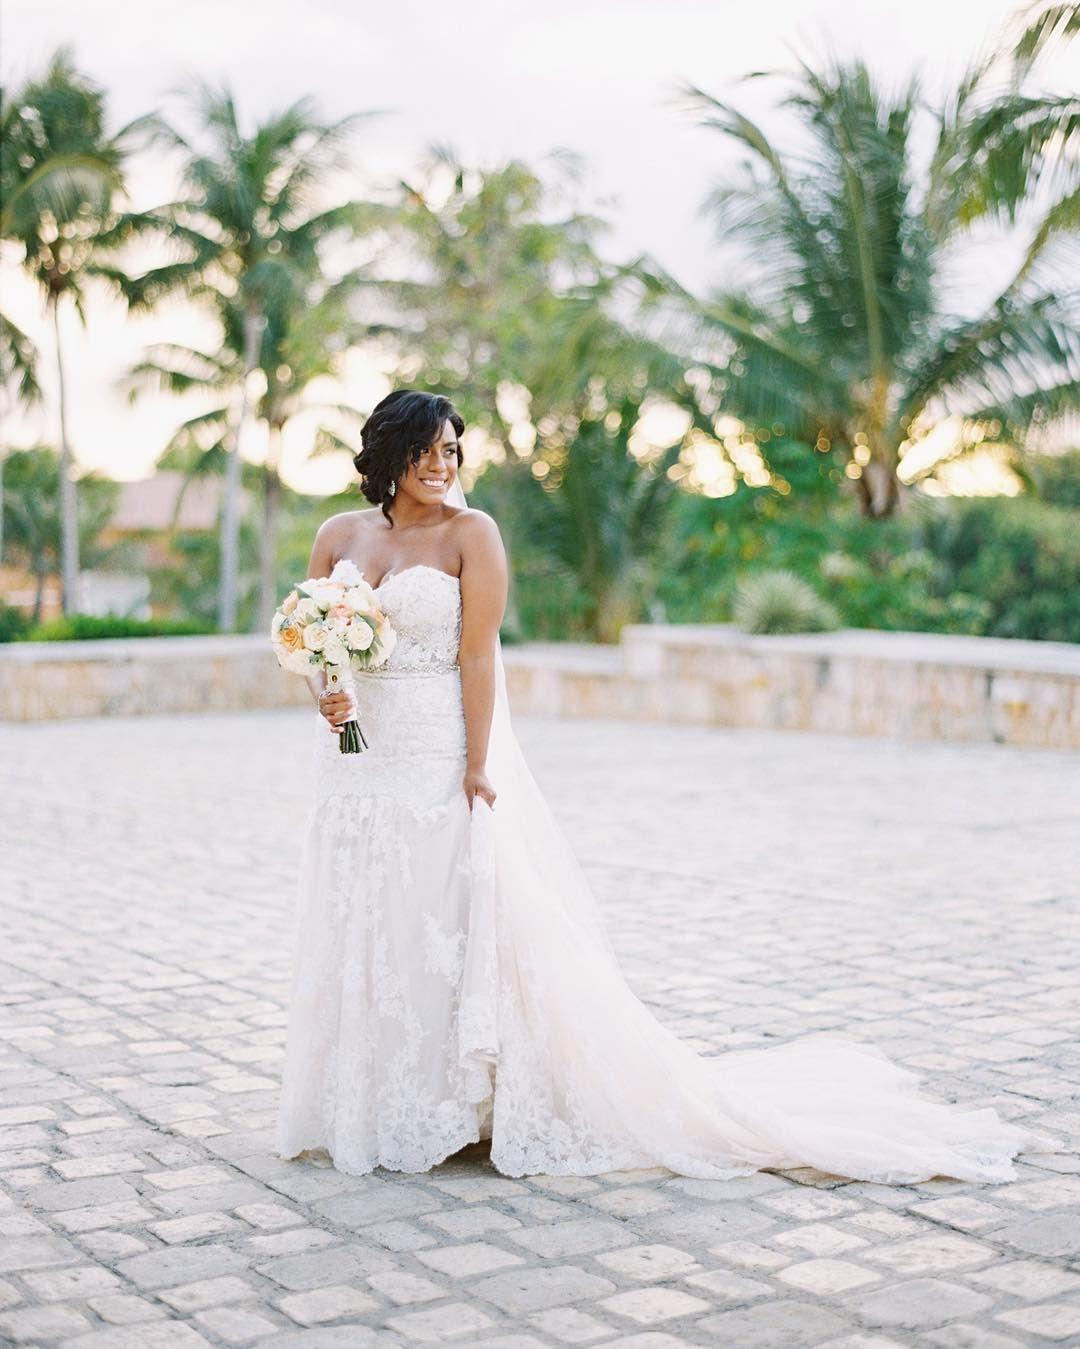 Regram via asiapimentelphotography look at my wedding dress in